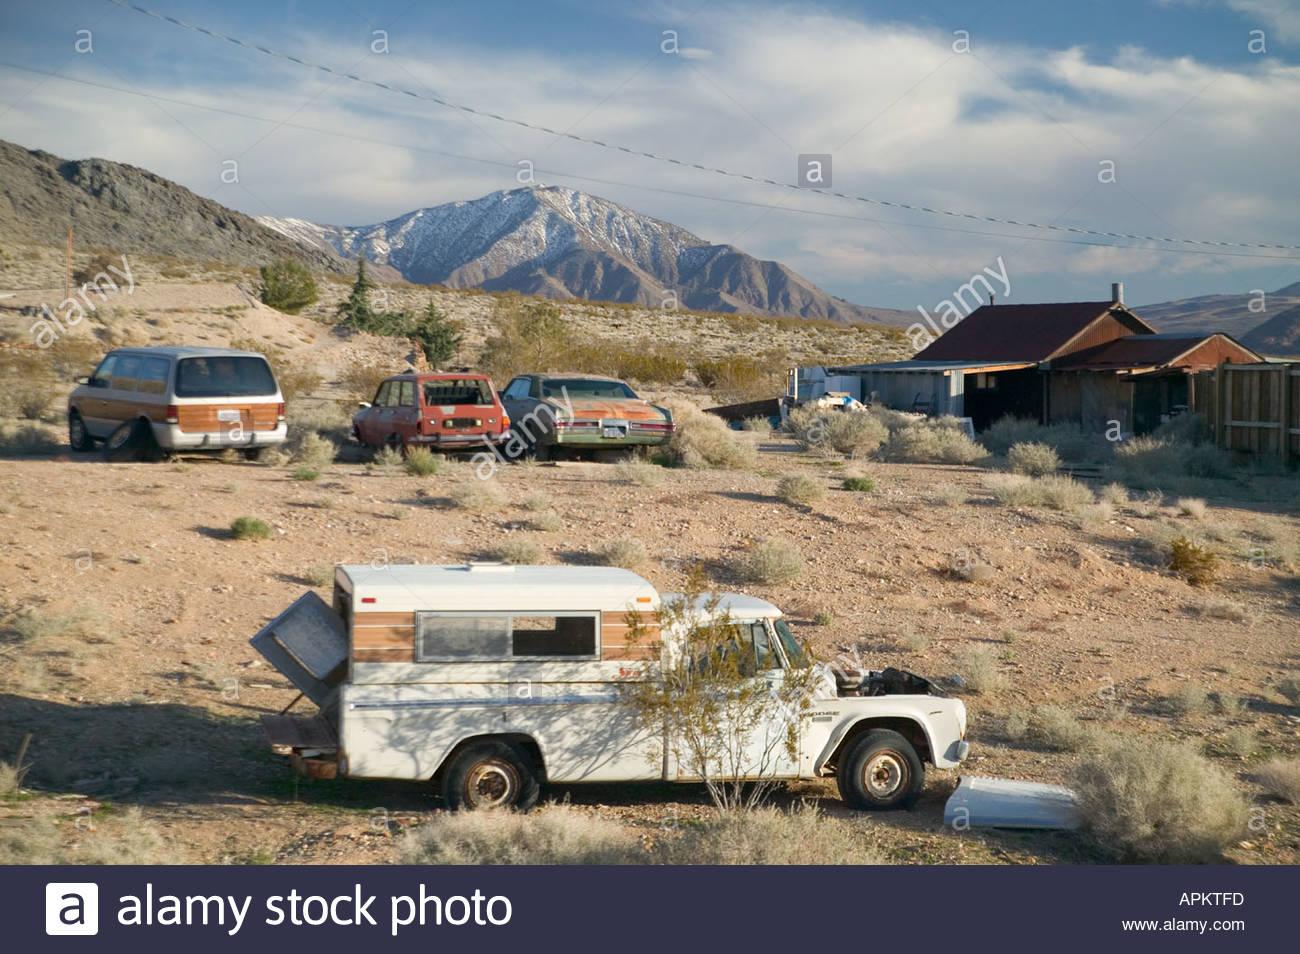 Junk cars. (Darwin, California, USA Stock Photo: 5164284 - Alamy